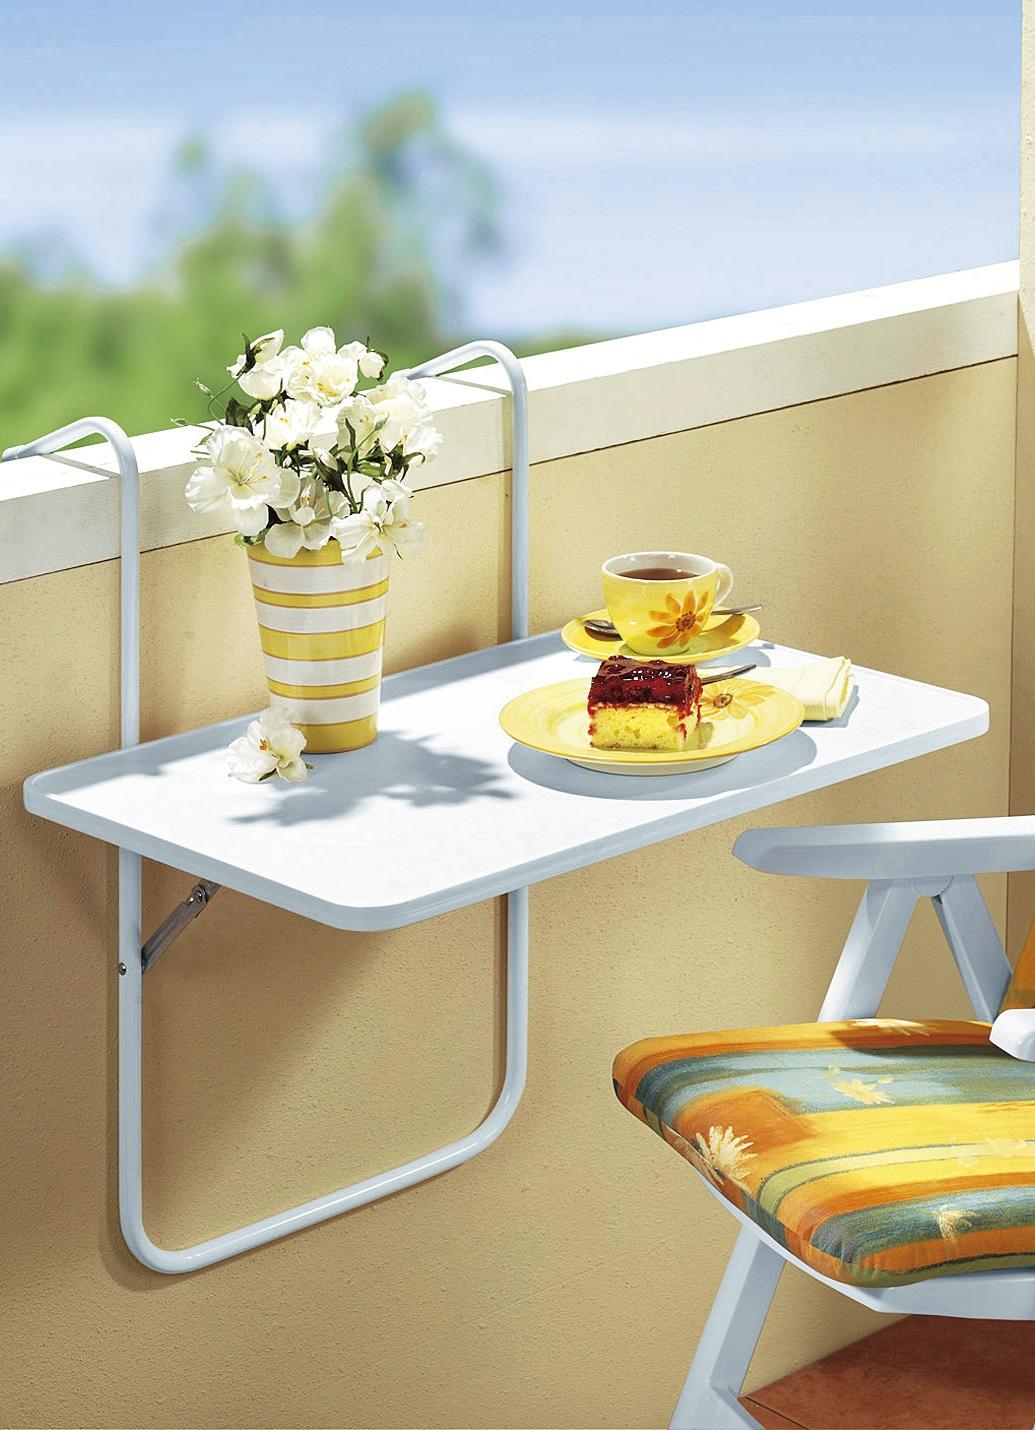 balkon h ngetisch in 2 farben gartenm bel brigitte salzburg. Black Bedroom Furniture Sets. Home Design Ideas